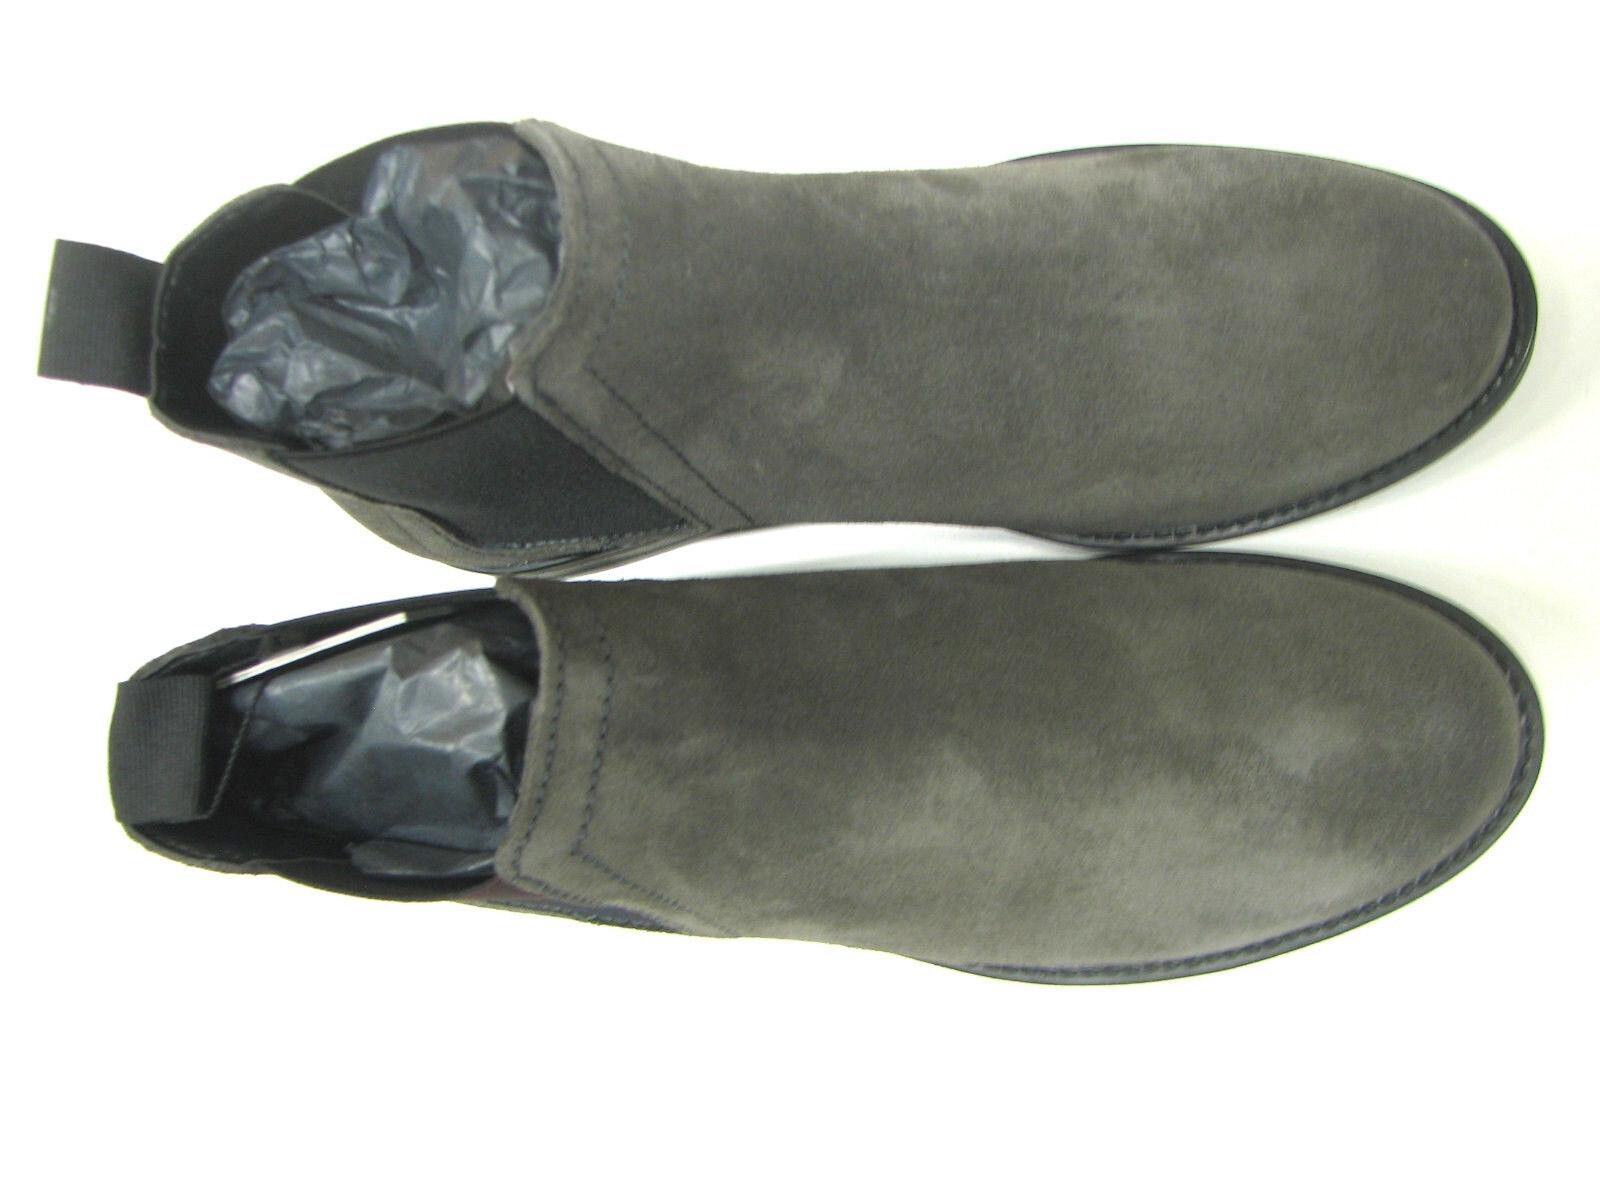 Tommy Hilfiger Stiefelette Stiefel Essential Chelsea Stiefel steel Grau Gr. Gr. Gr. 39 .. a6e05c